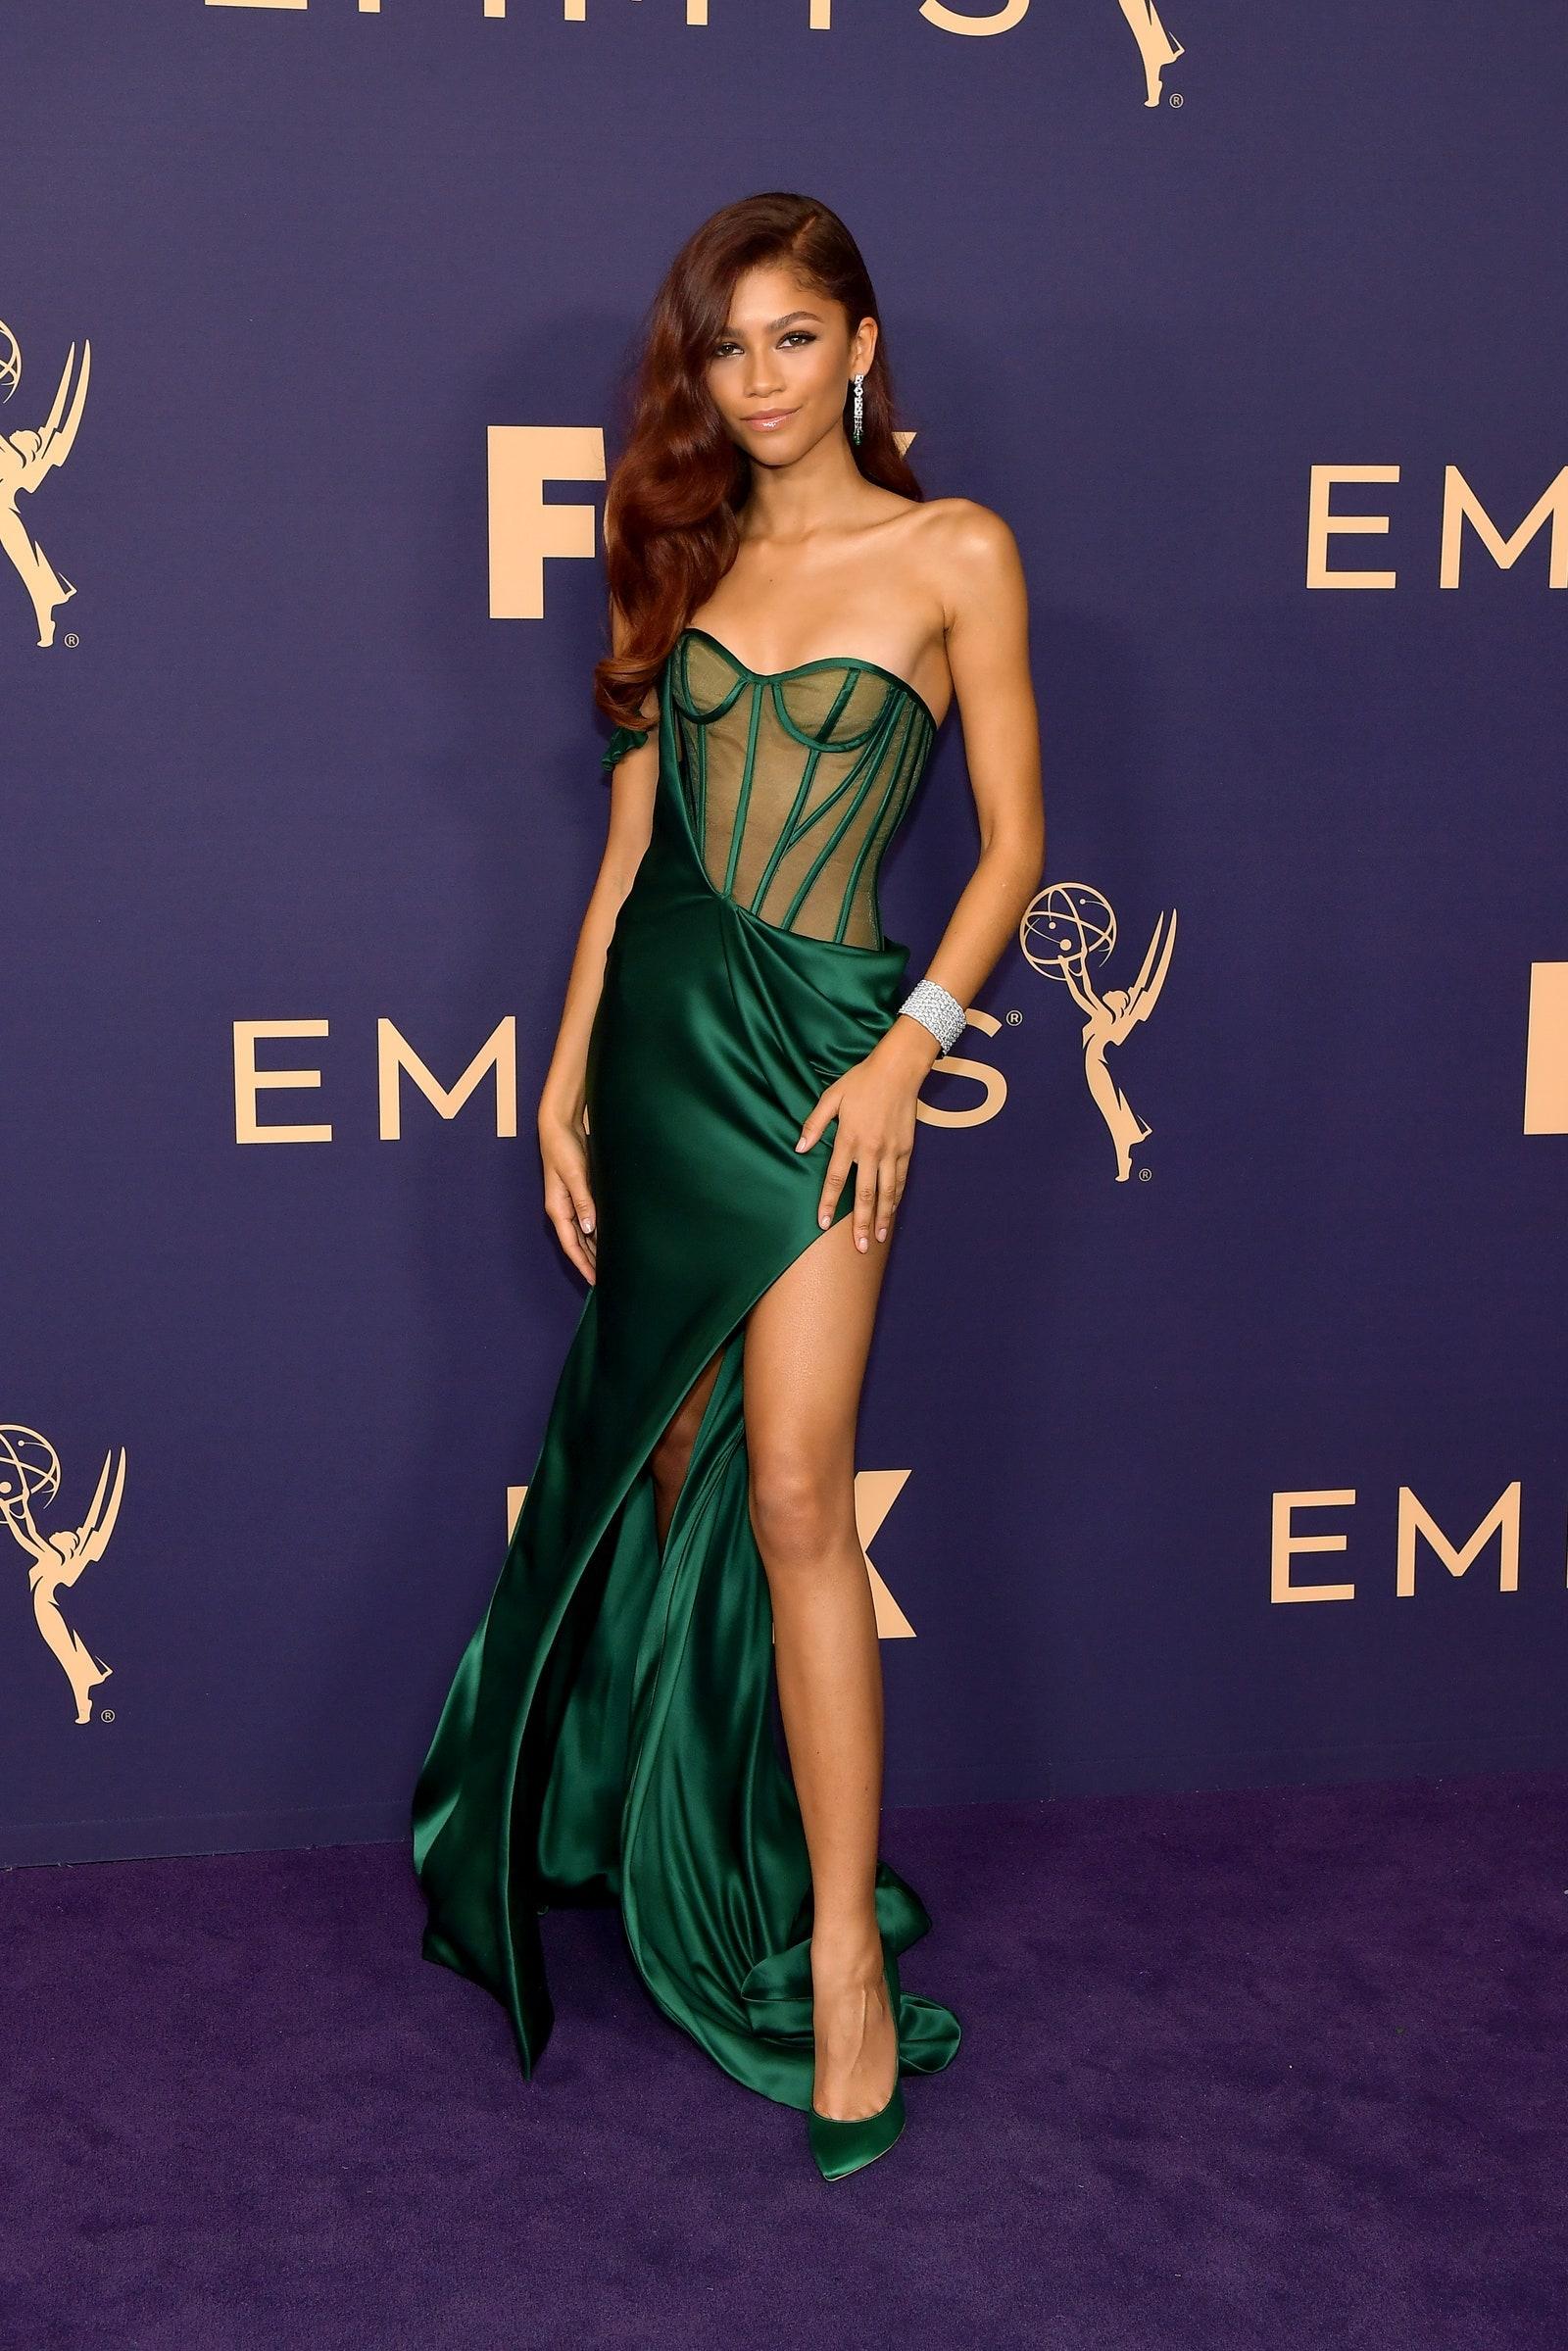 Зендая във Vera Wang Collection и Cartier jewelry, 71st Emmy Awards (2019)